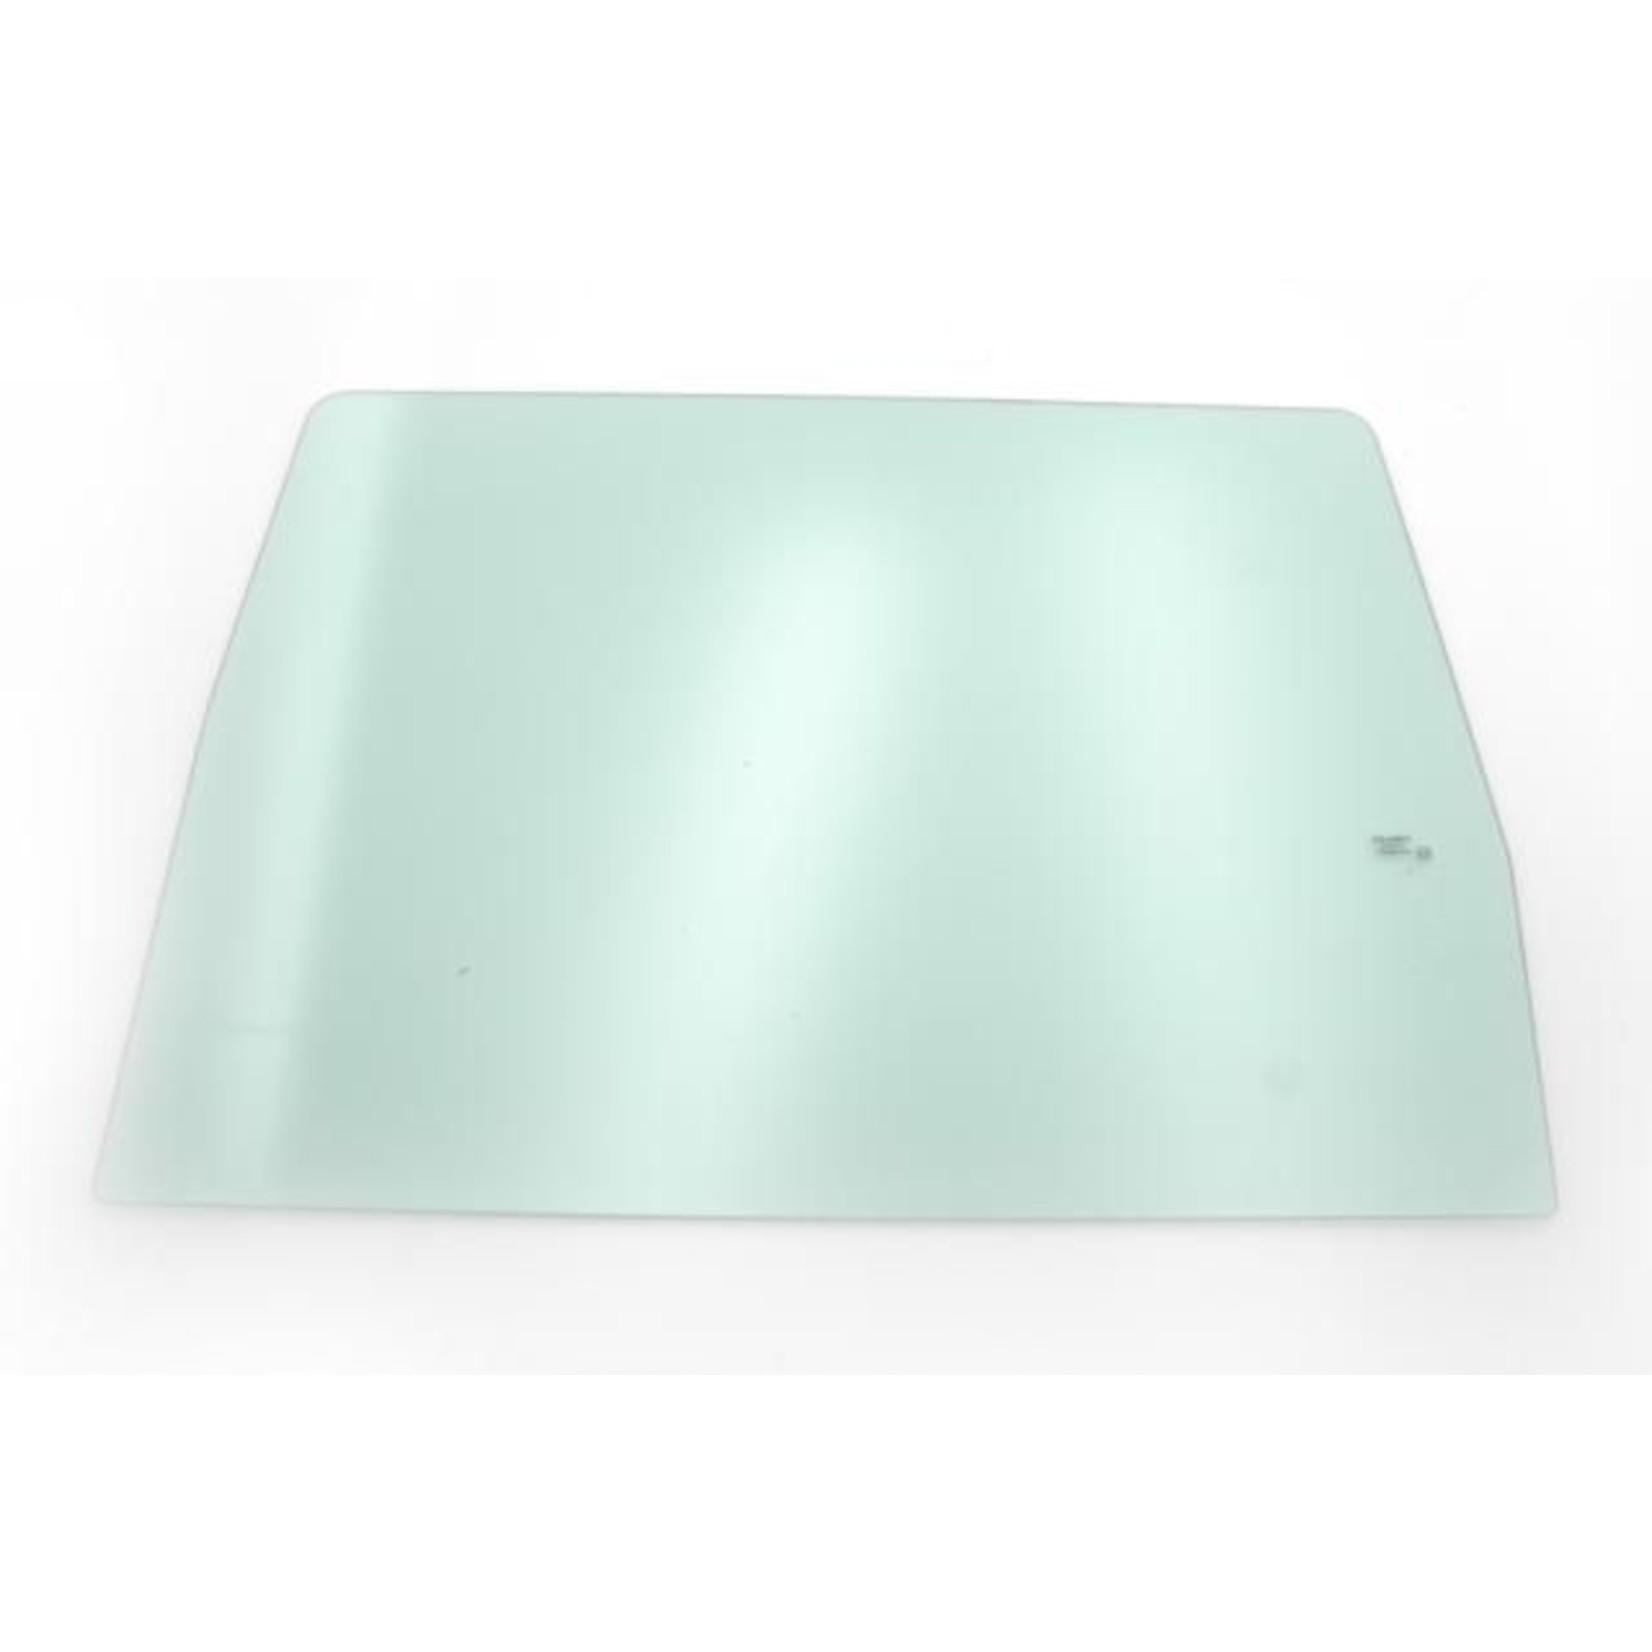 Cristal de puerta coloreado trasera Nr Org: DX9616A